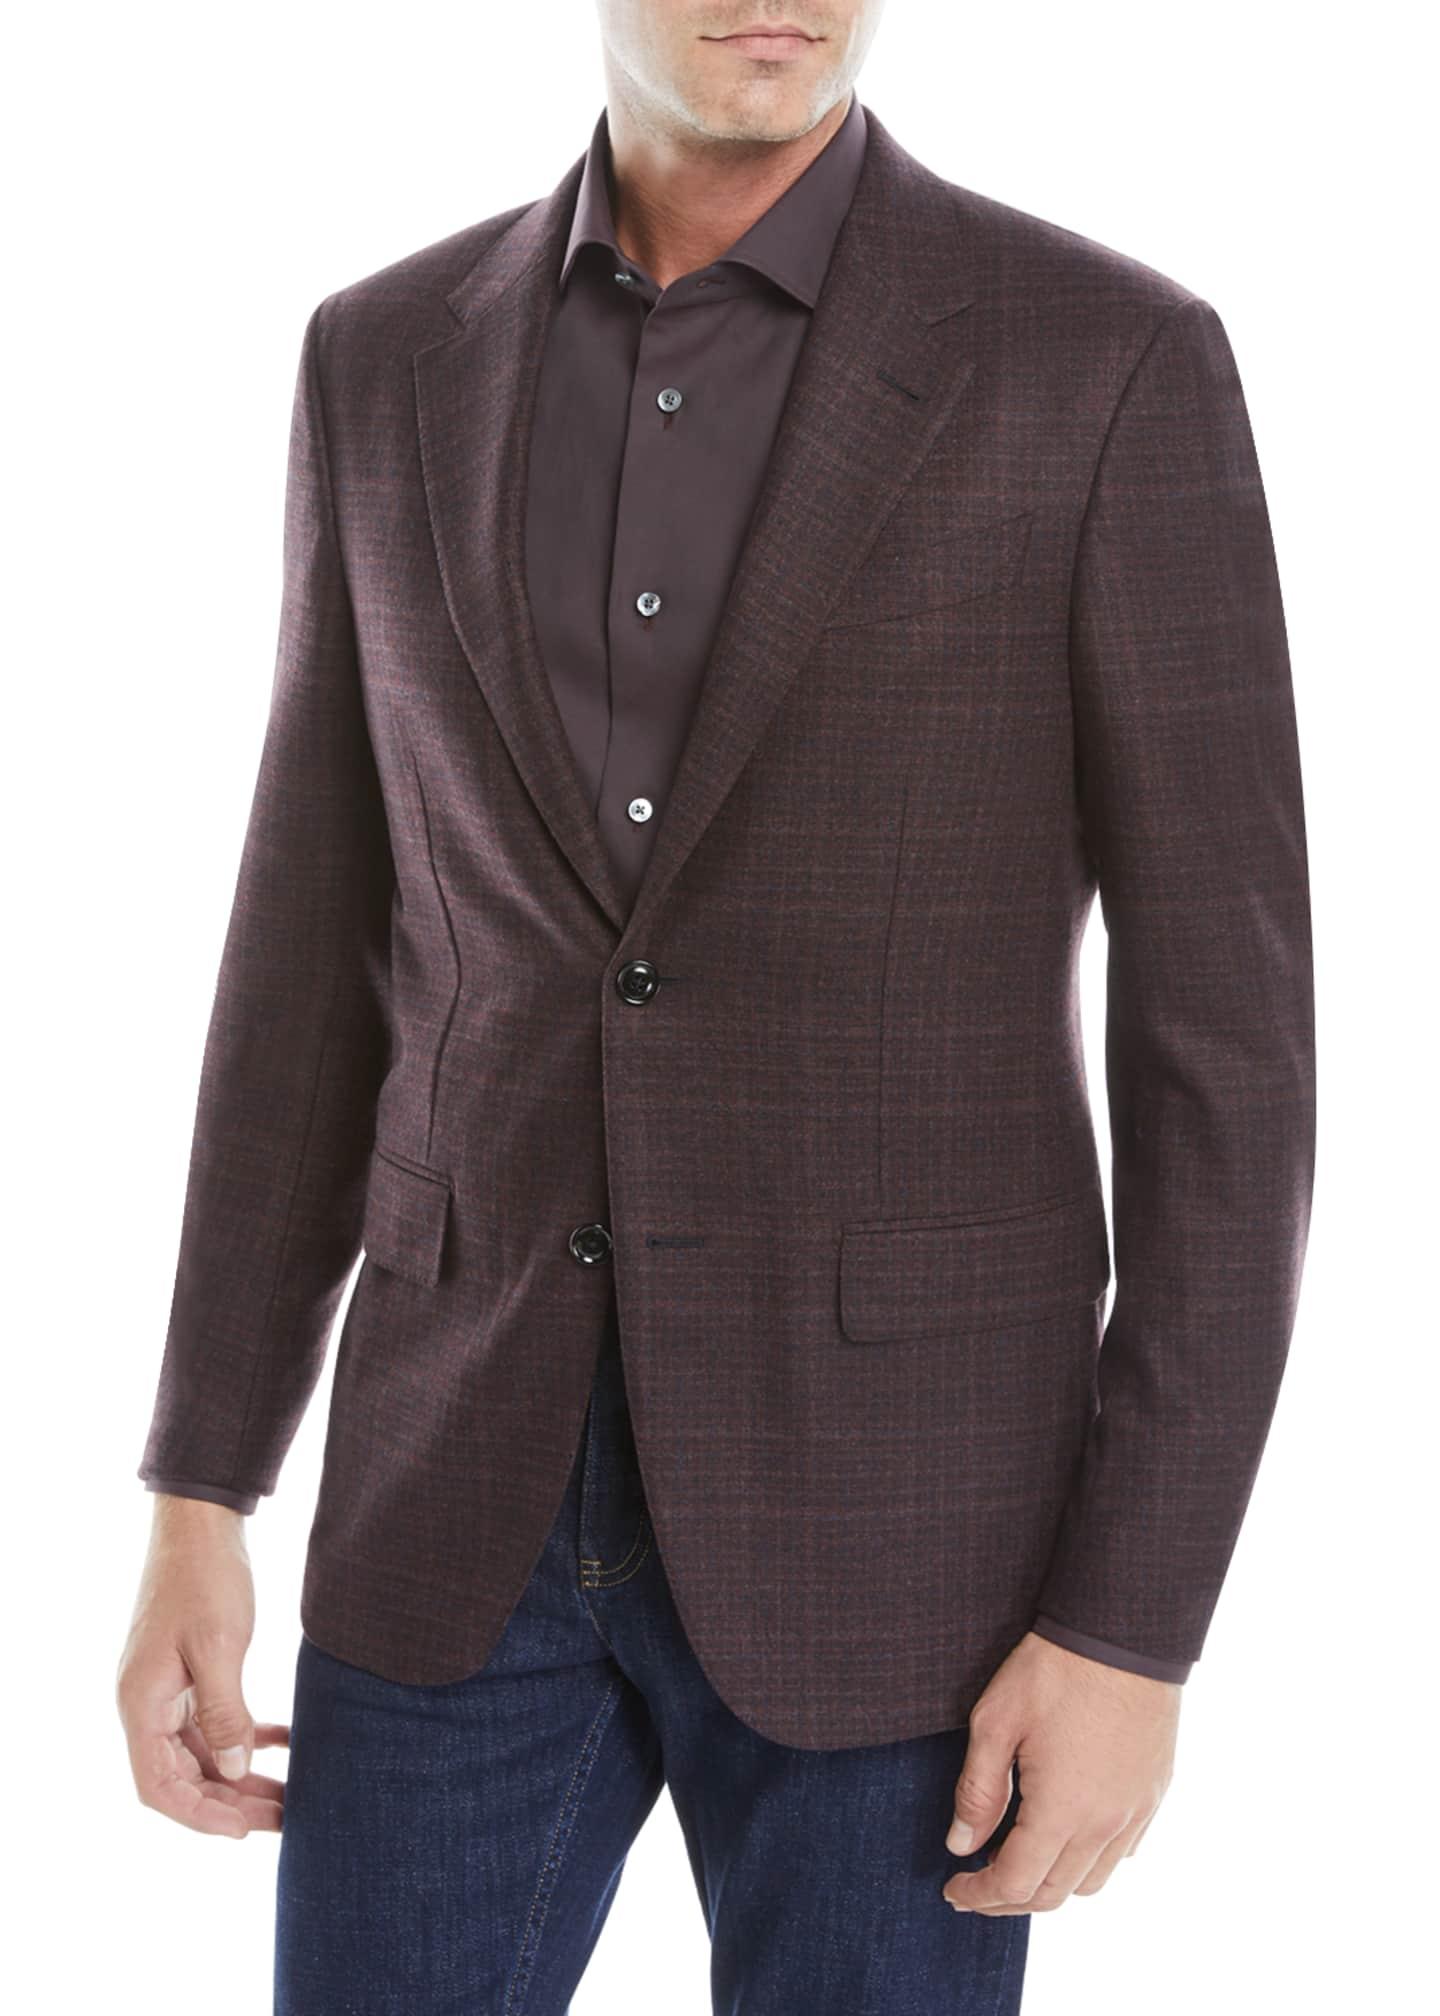 Ermenegildo Zegna Men's Two-Button Tonal Plaid Wool/Cashmere